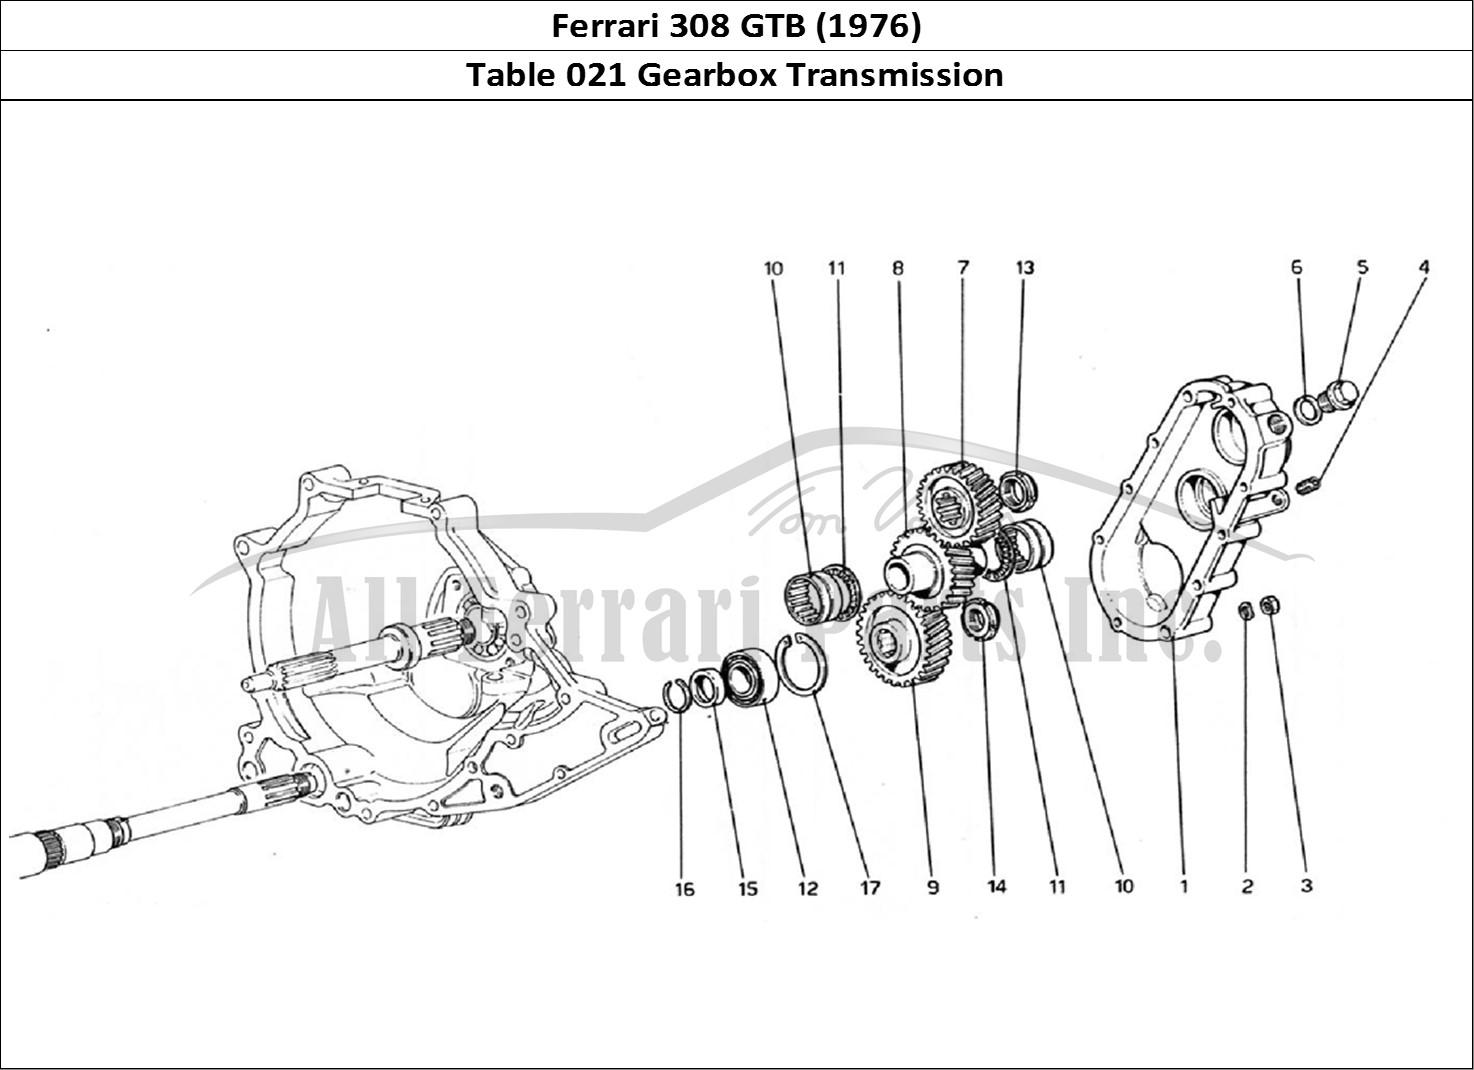 Buy original Ferrari 308 GTB (1976) 021 Gearbox